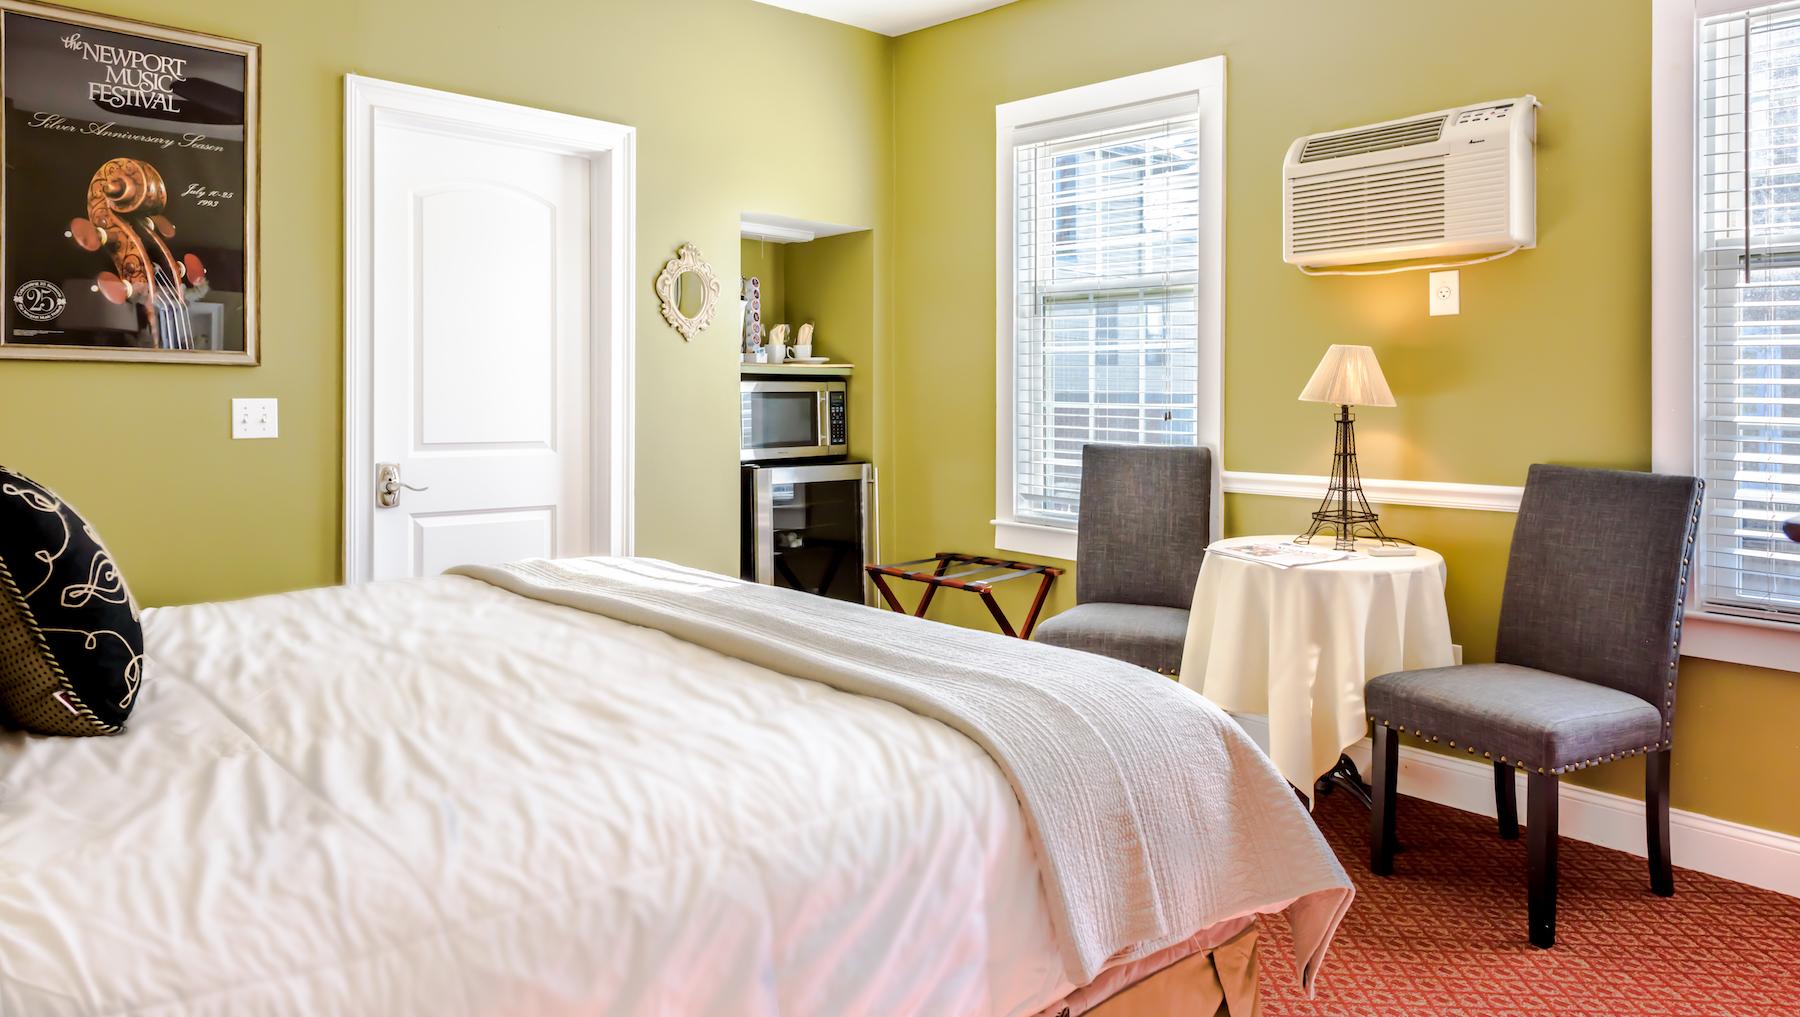 Inn-Room-8-and-Bathroom-20180501-083-Edit-1